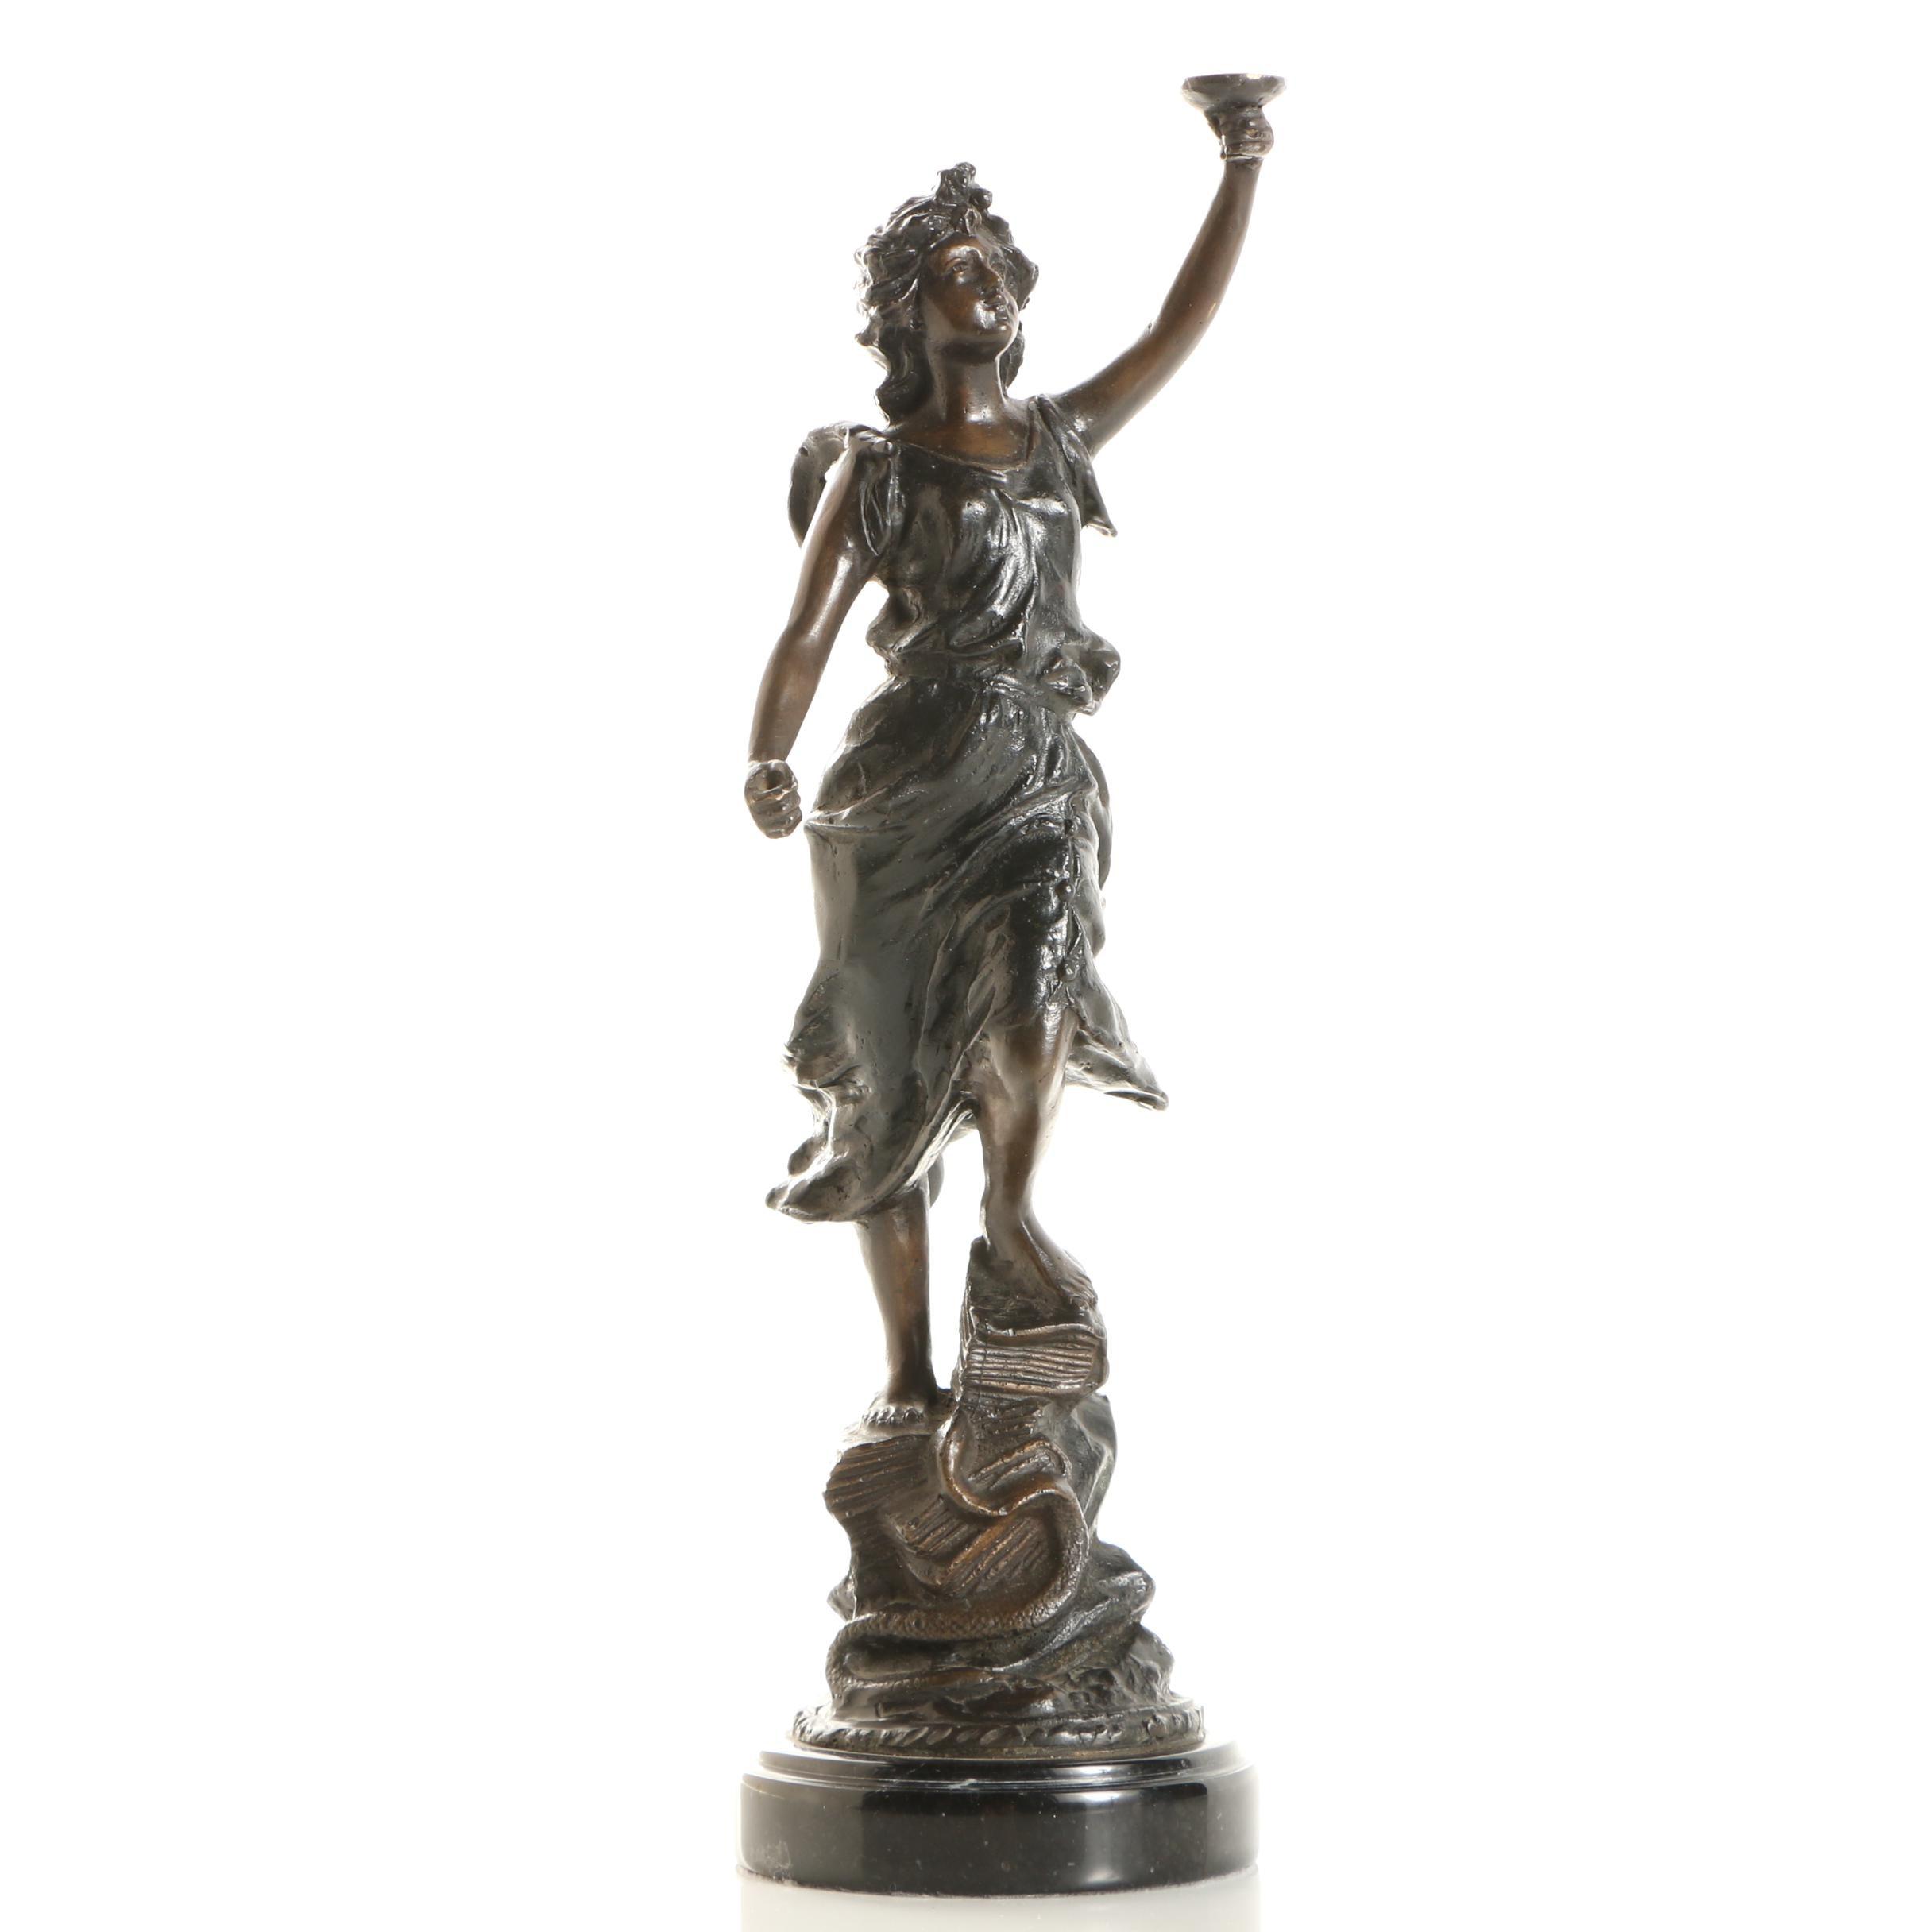 Spelter Sculpture of a Classical Figure